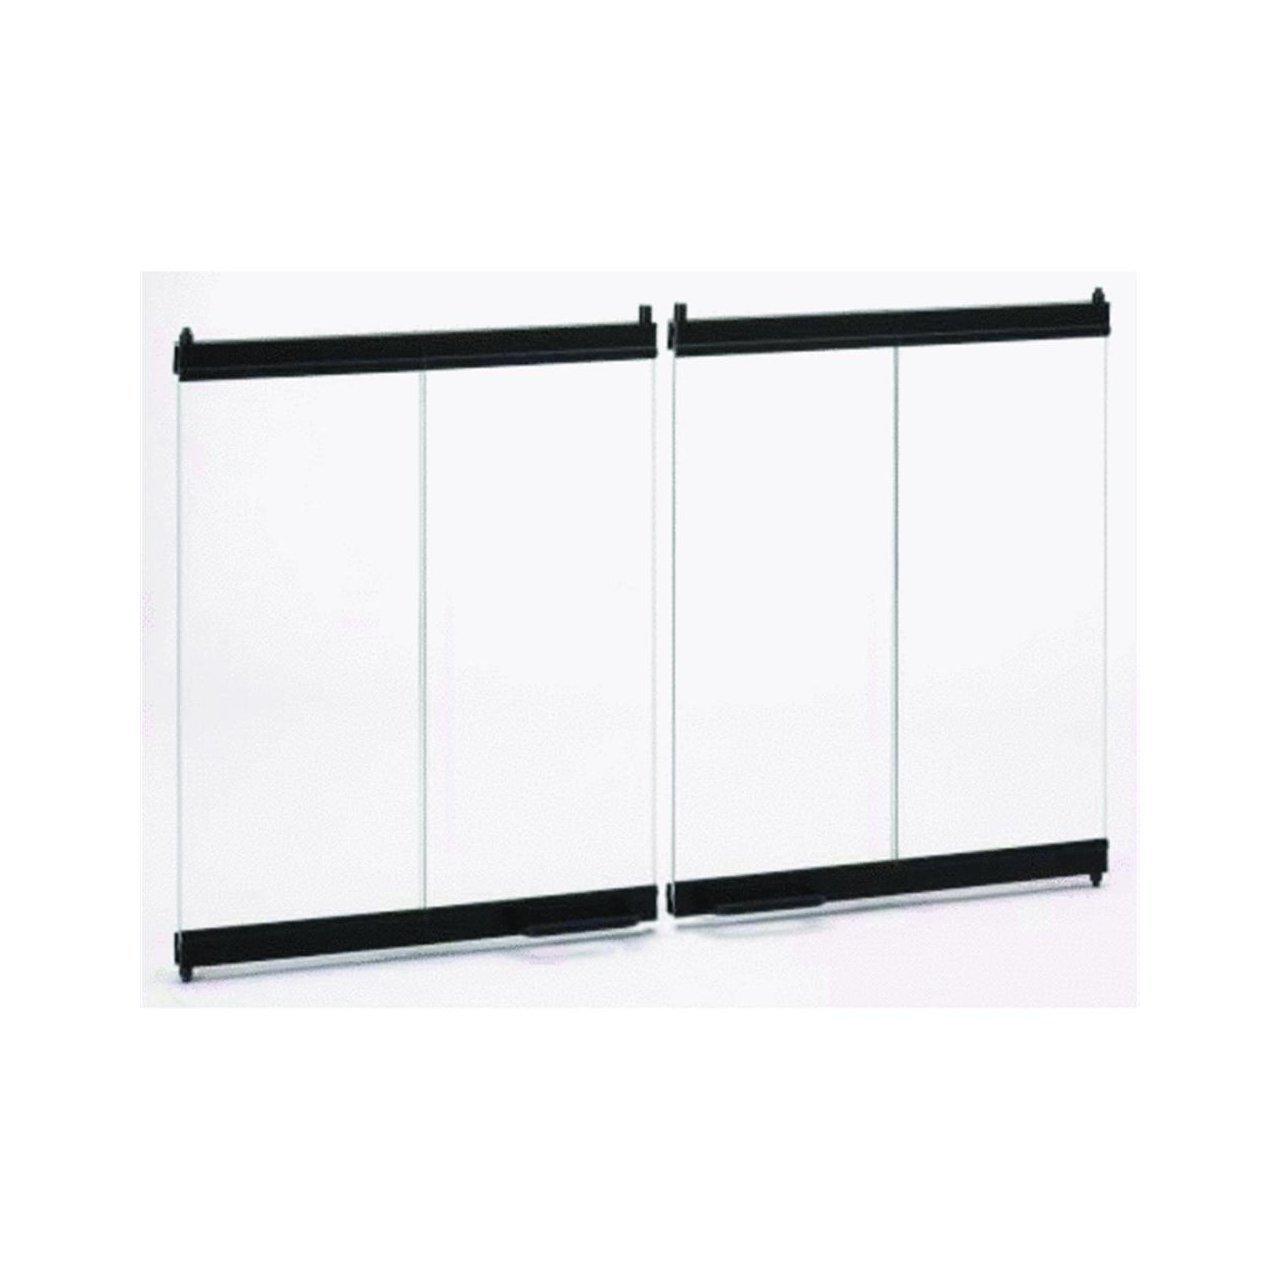 amazon com temco majestic bi fold glass fireplace doors 42 x 23